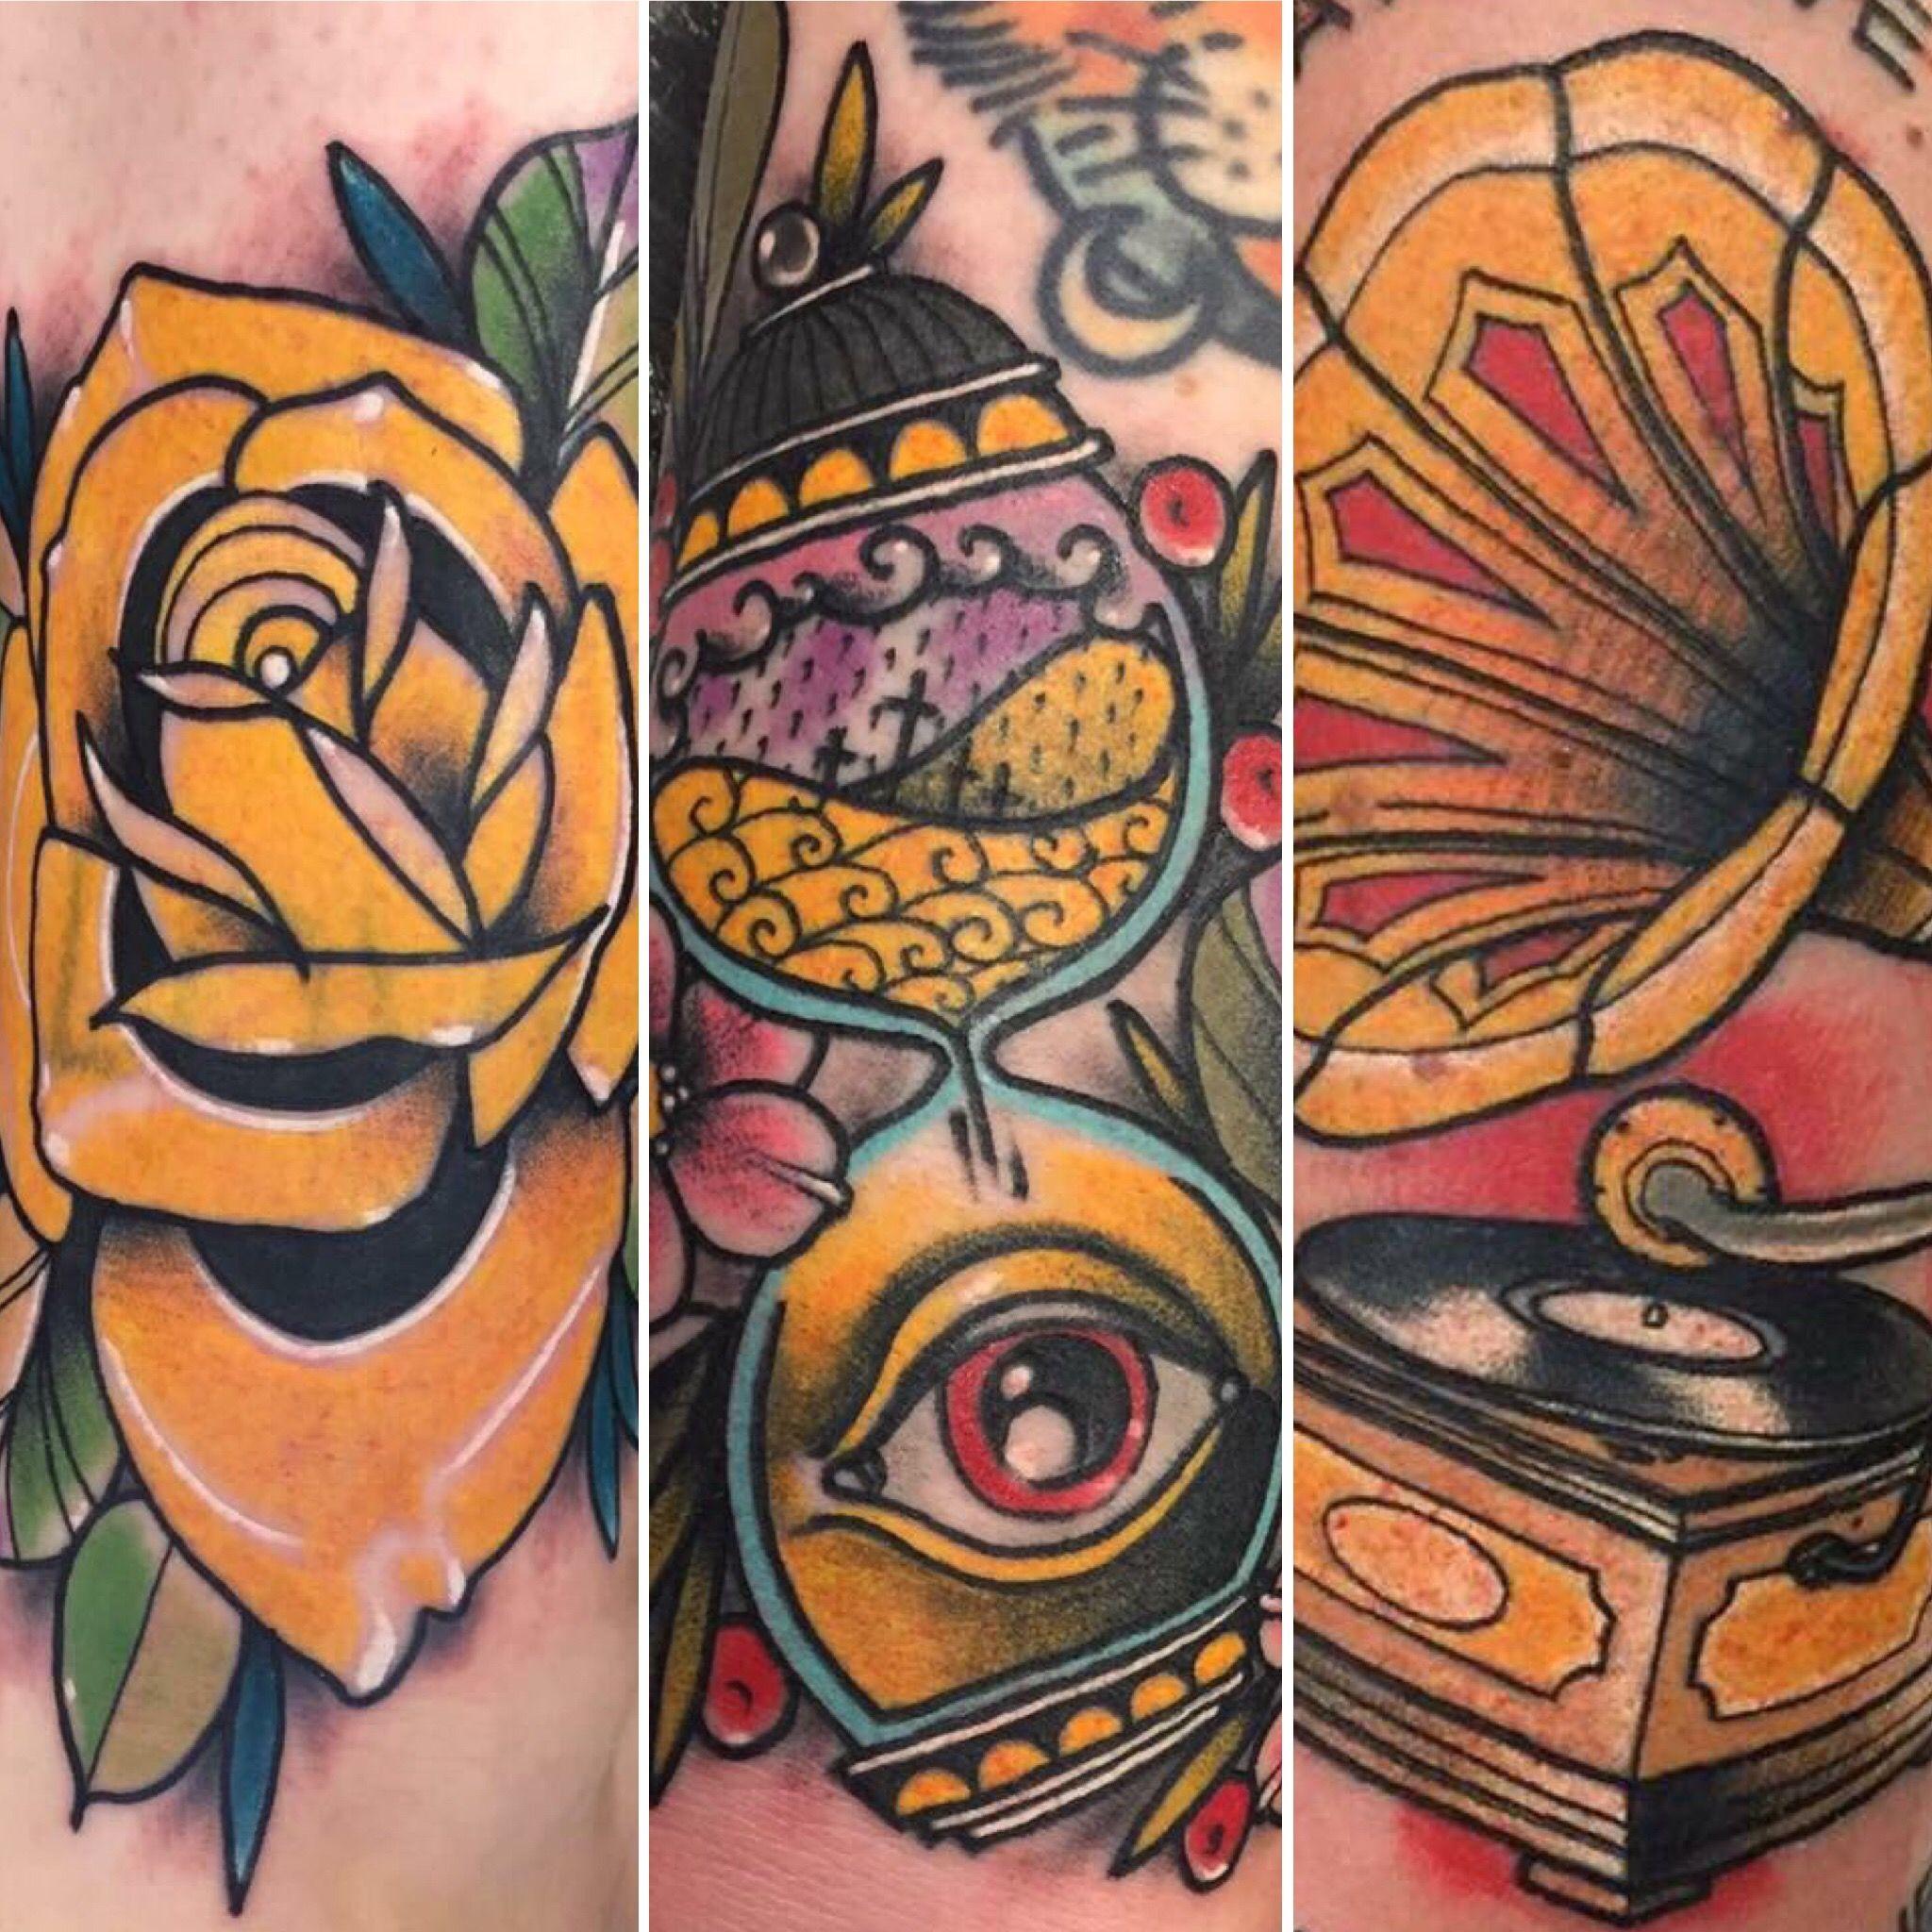 Camden Piercing And Tattoo Camden Tattoo Tattoos Londontattoo Tattoos By Niall At Camden Piercing And Tatttoo S London Tattoo Tattoo Studio Piercing Tattoo